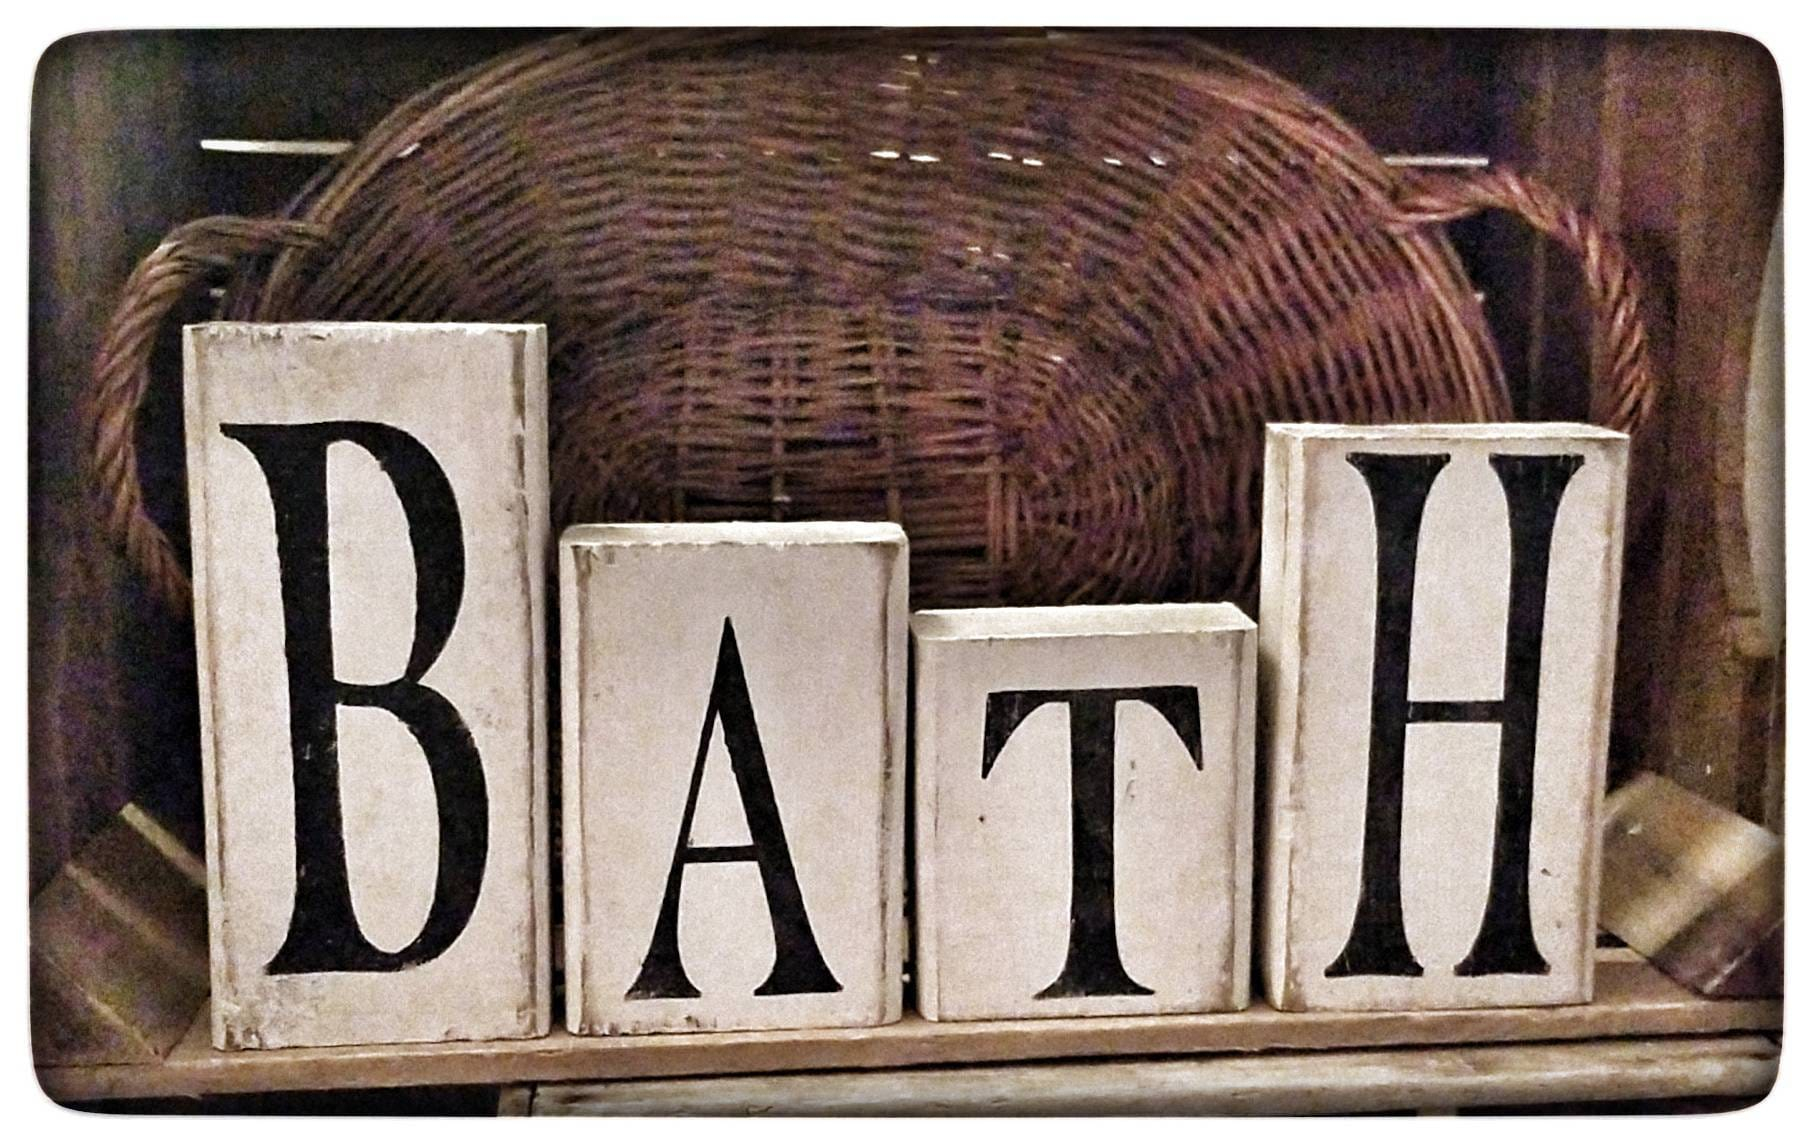 Bath Block Set Americana Decor Americana Block Set Primitive Decor Primitive Home Decor Americana Decor Decor Rustic Decor Bathroom Decor